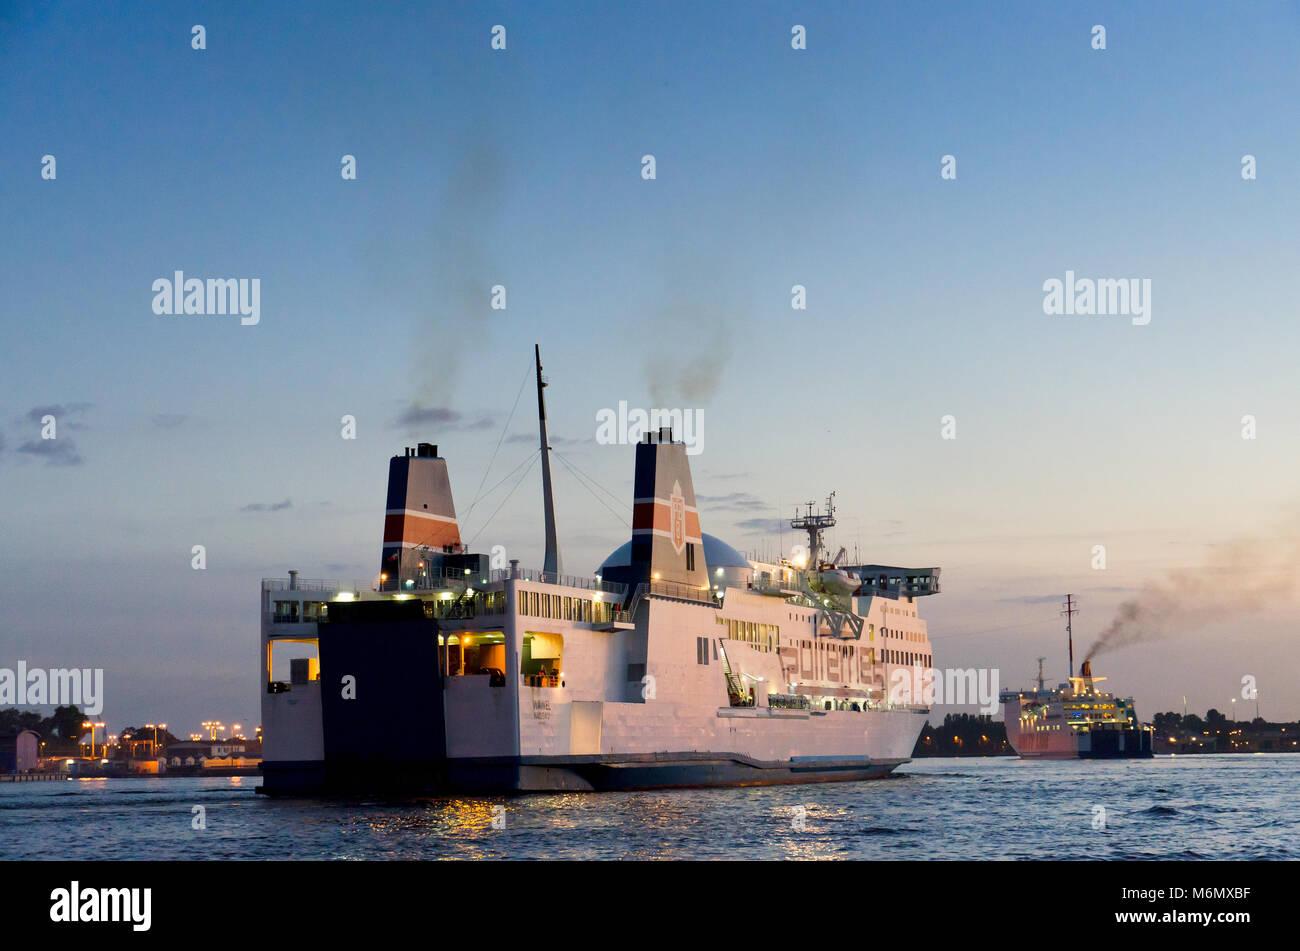 Ferryboat on Swina river in town of Swinoujscie, Uznam island, Westpomeranian voivodeship, Poland Europe. Stock Photo